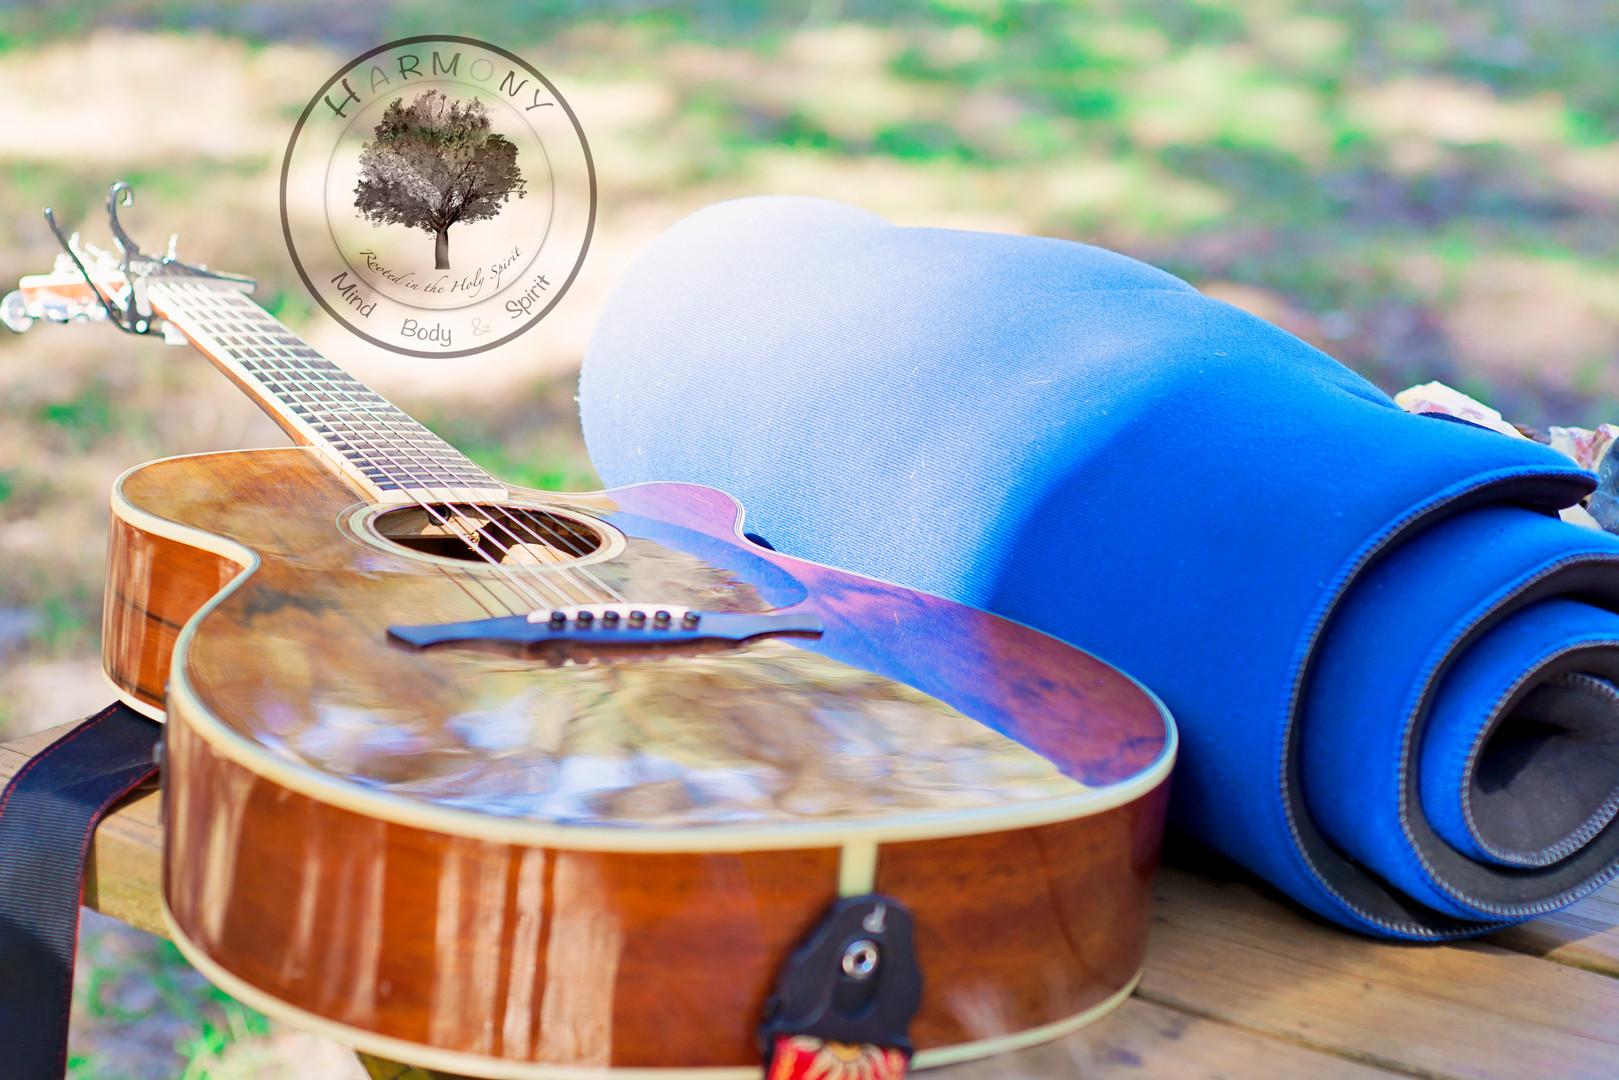 Live music and Yoga